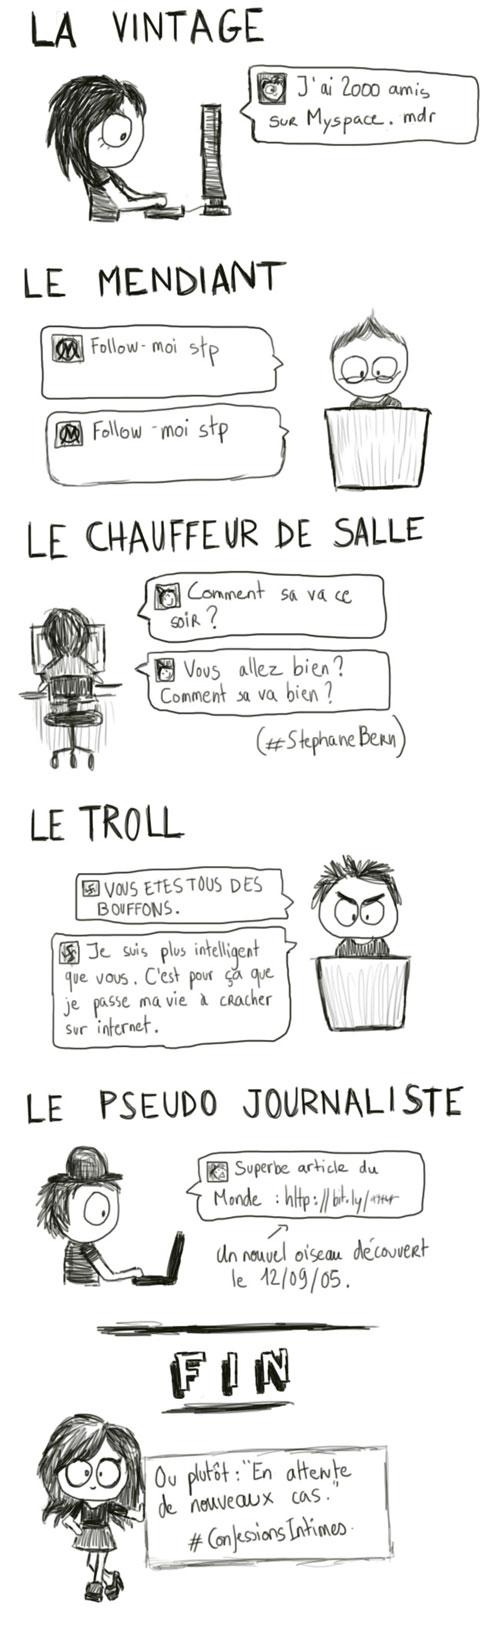 Twitter : Profils utilisateurs 2